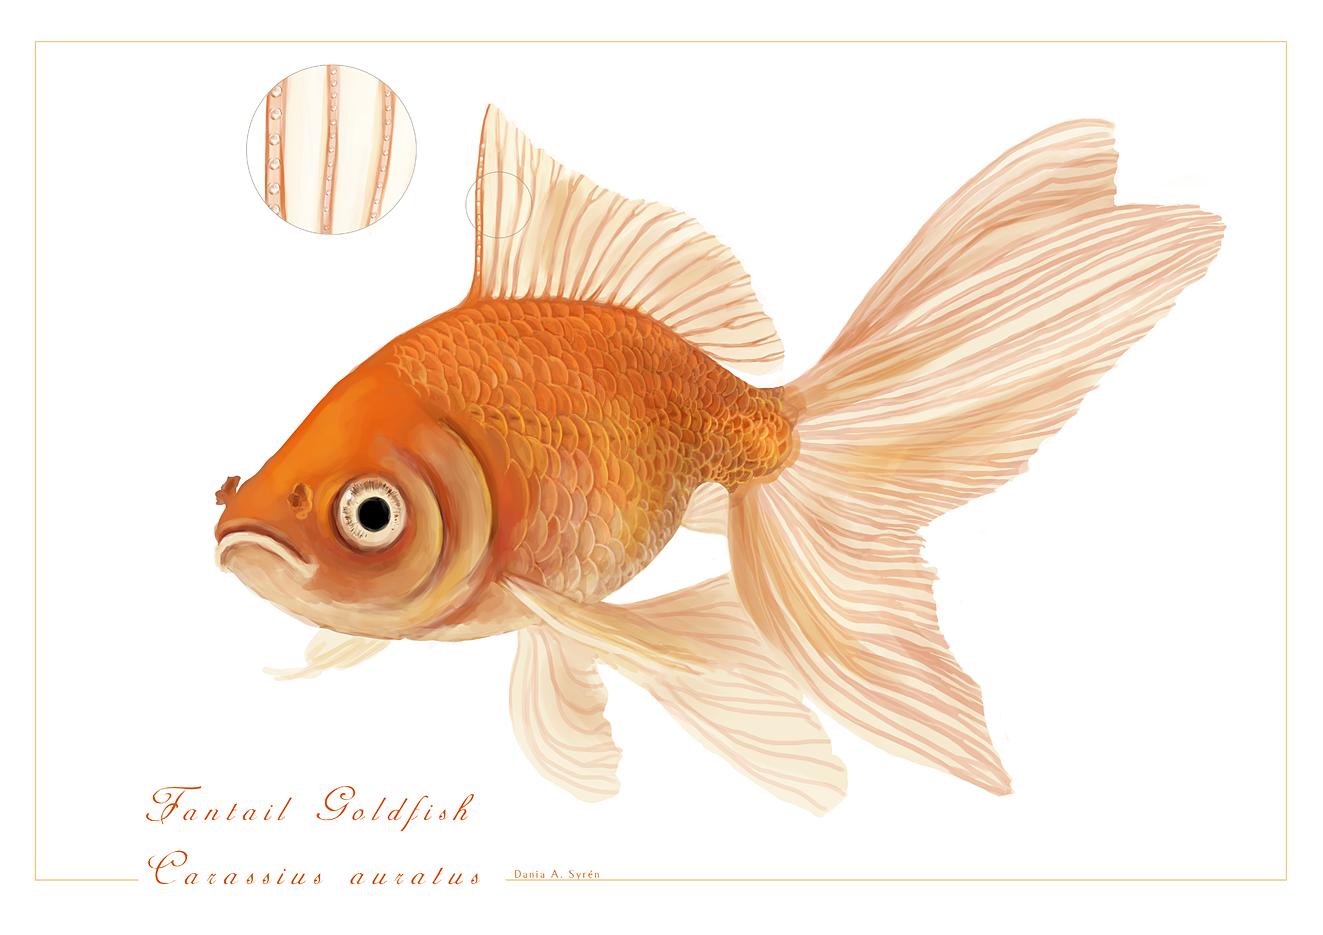 Drawn goldfish fancy goldfish Fantail Fantail photo#5 Drawing goldfish